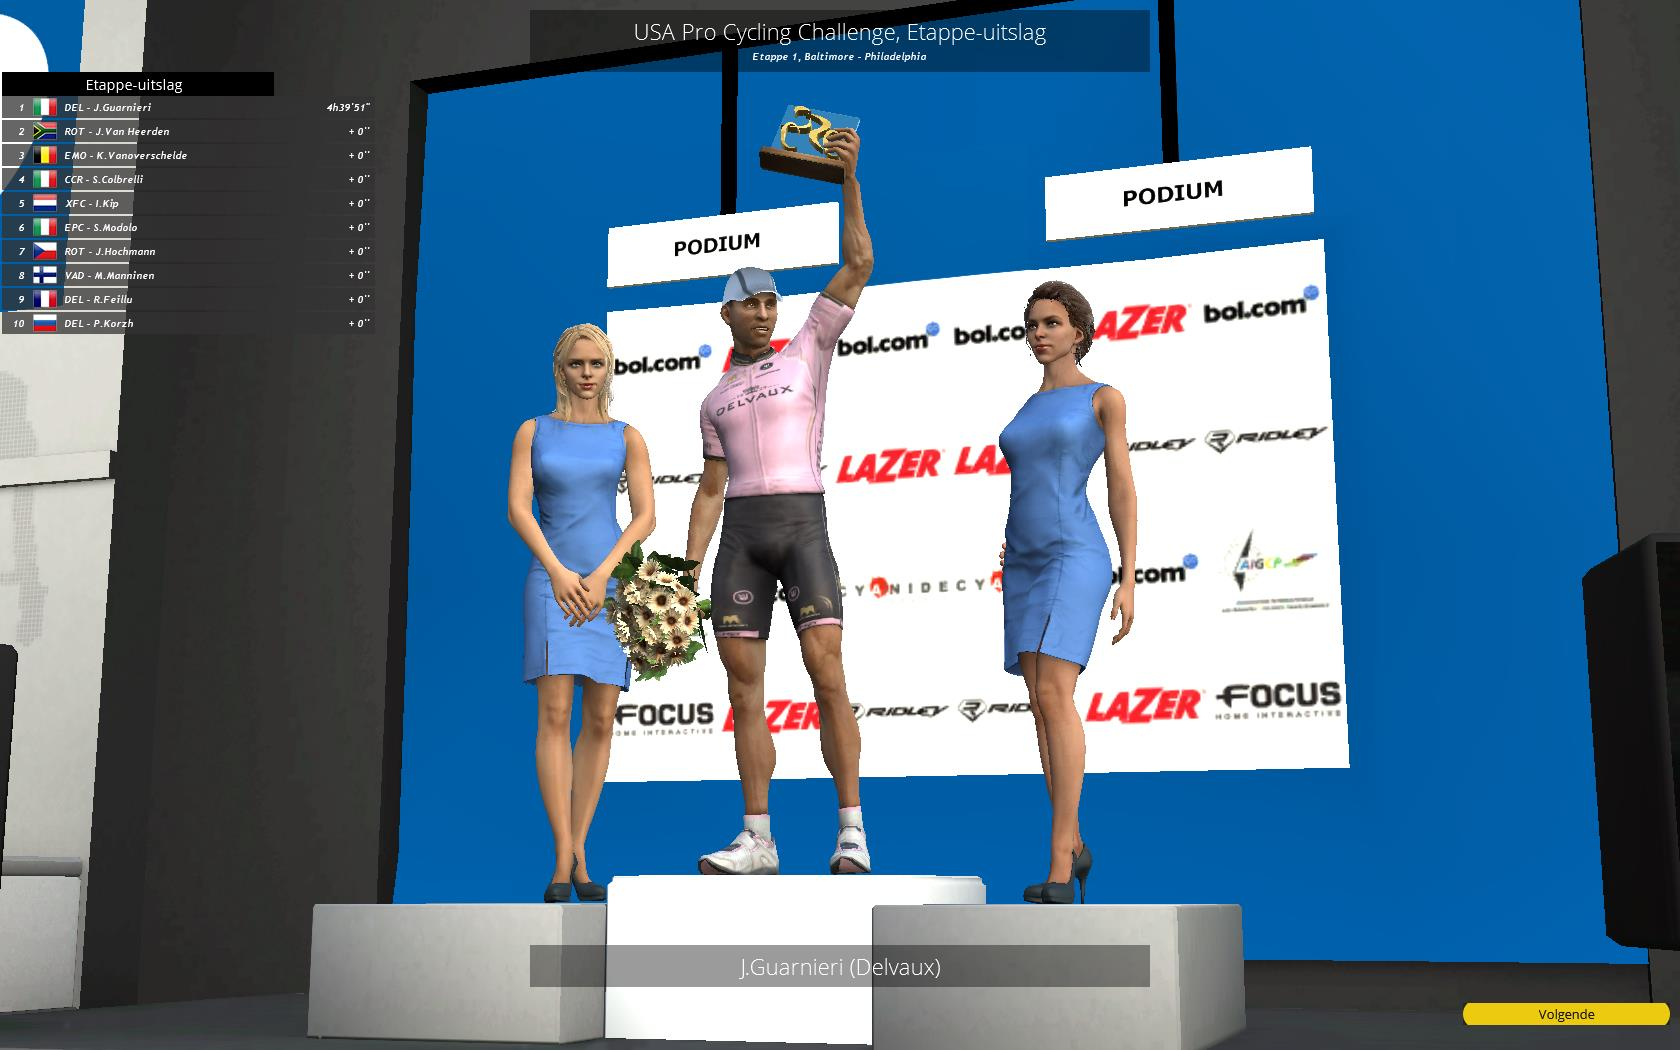 pcmdaily.com/images/mg/2018/Races/C2/USAPCC/1/PCM0019.jpg